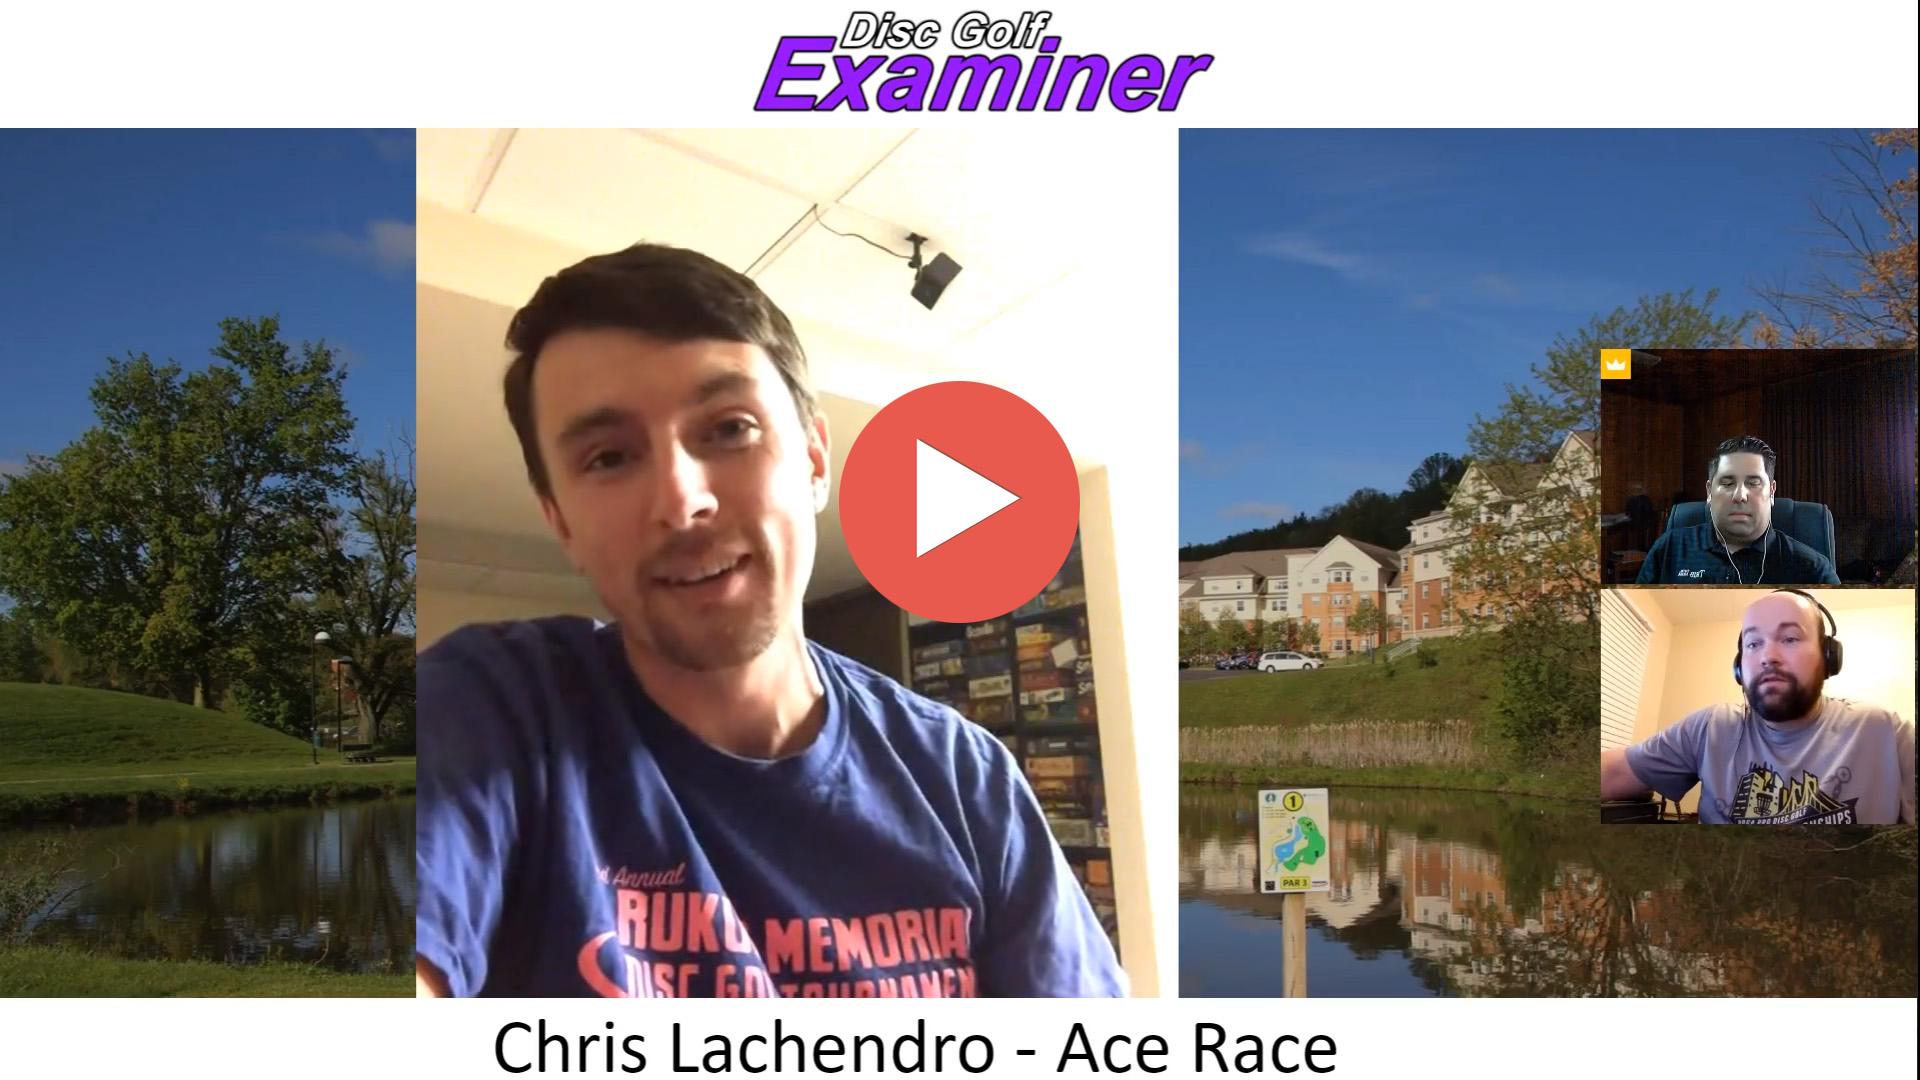 Chris Lachendro, Ace Race, PFDO – Volunteers Needed!